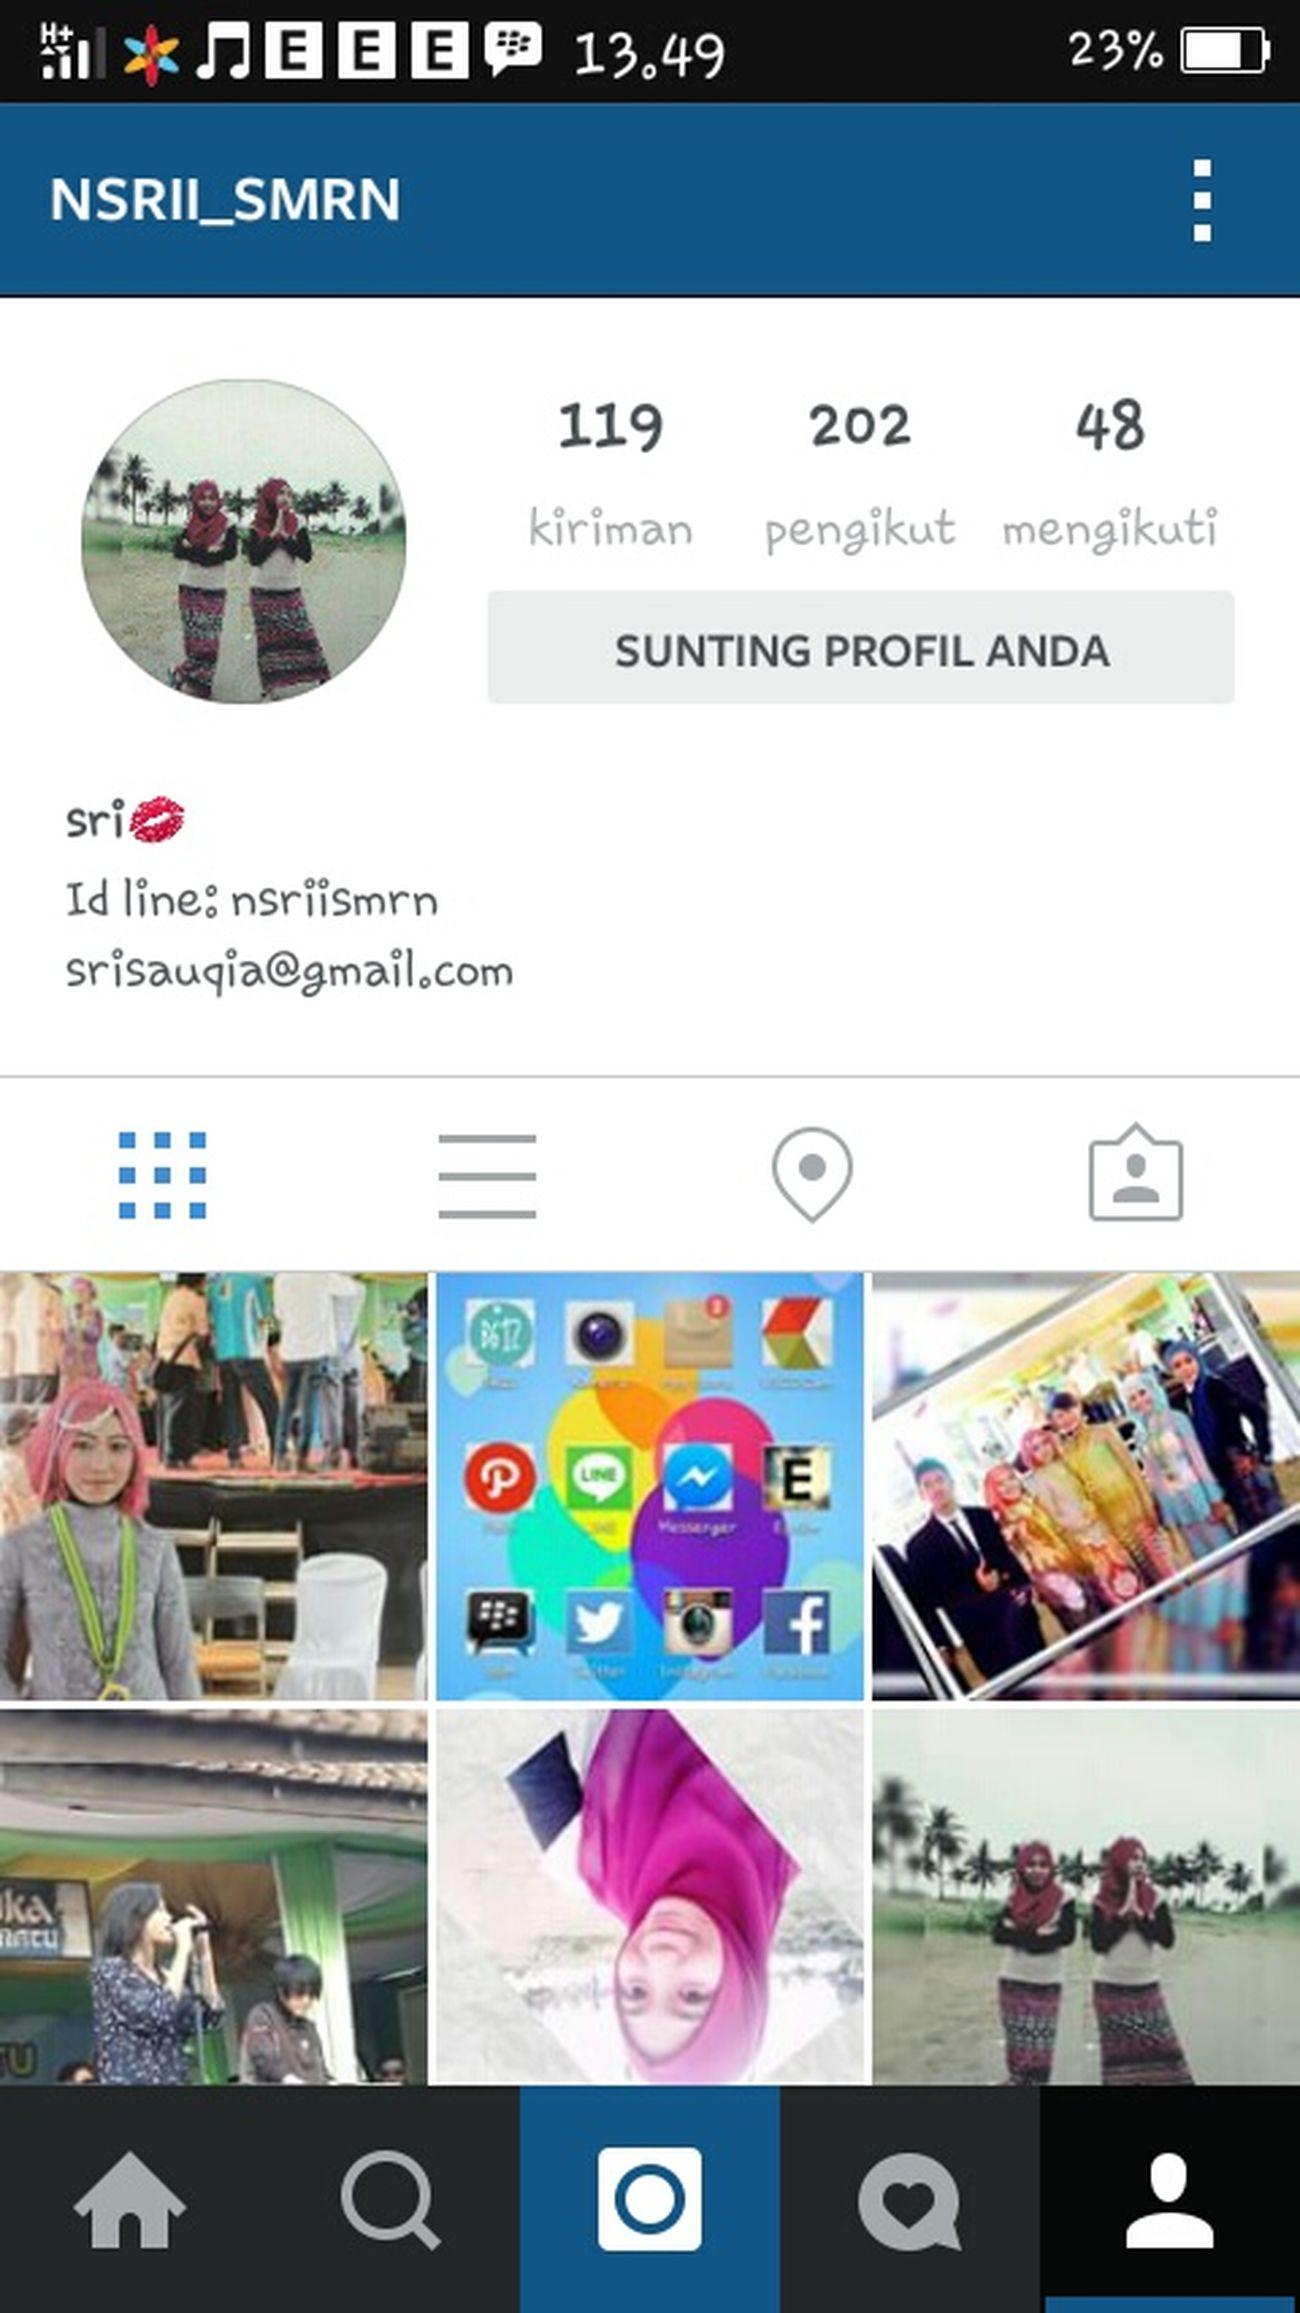 Followme FollowMeOnInstagram Follow Me On Instagram Nsrii_smrn Thankfull